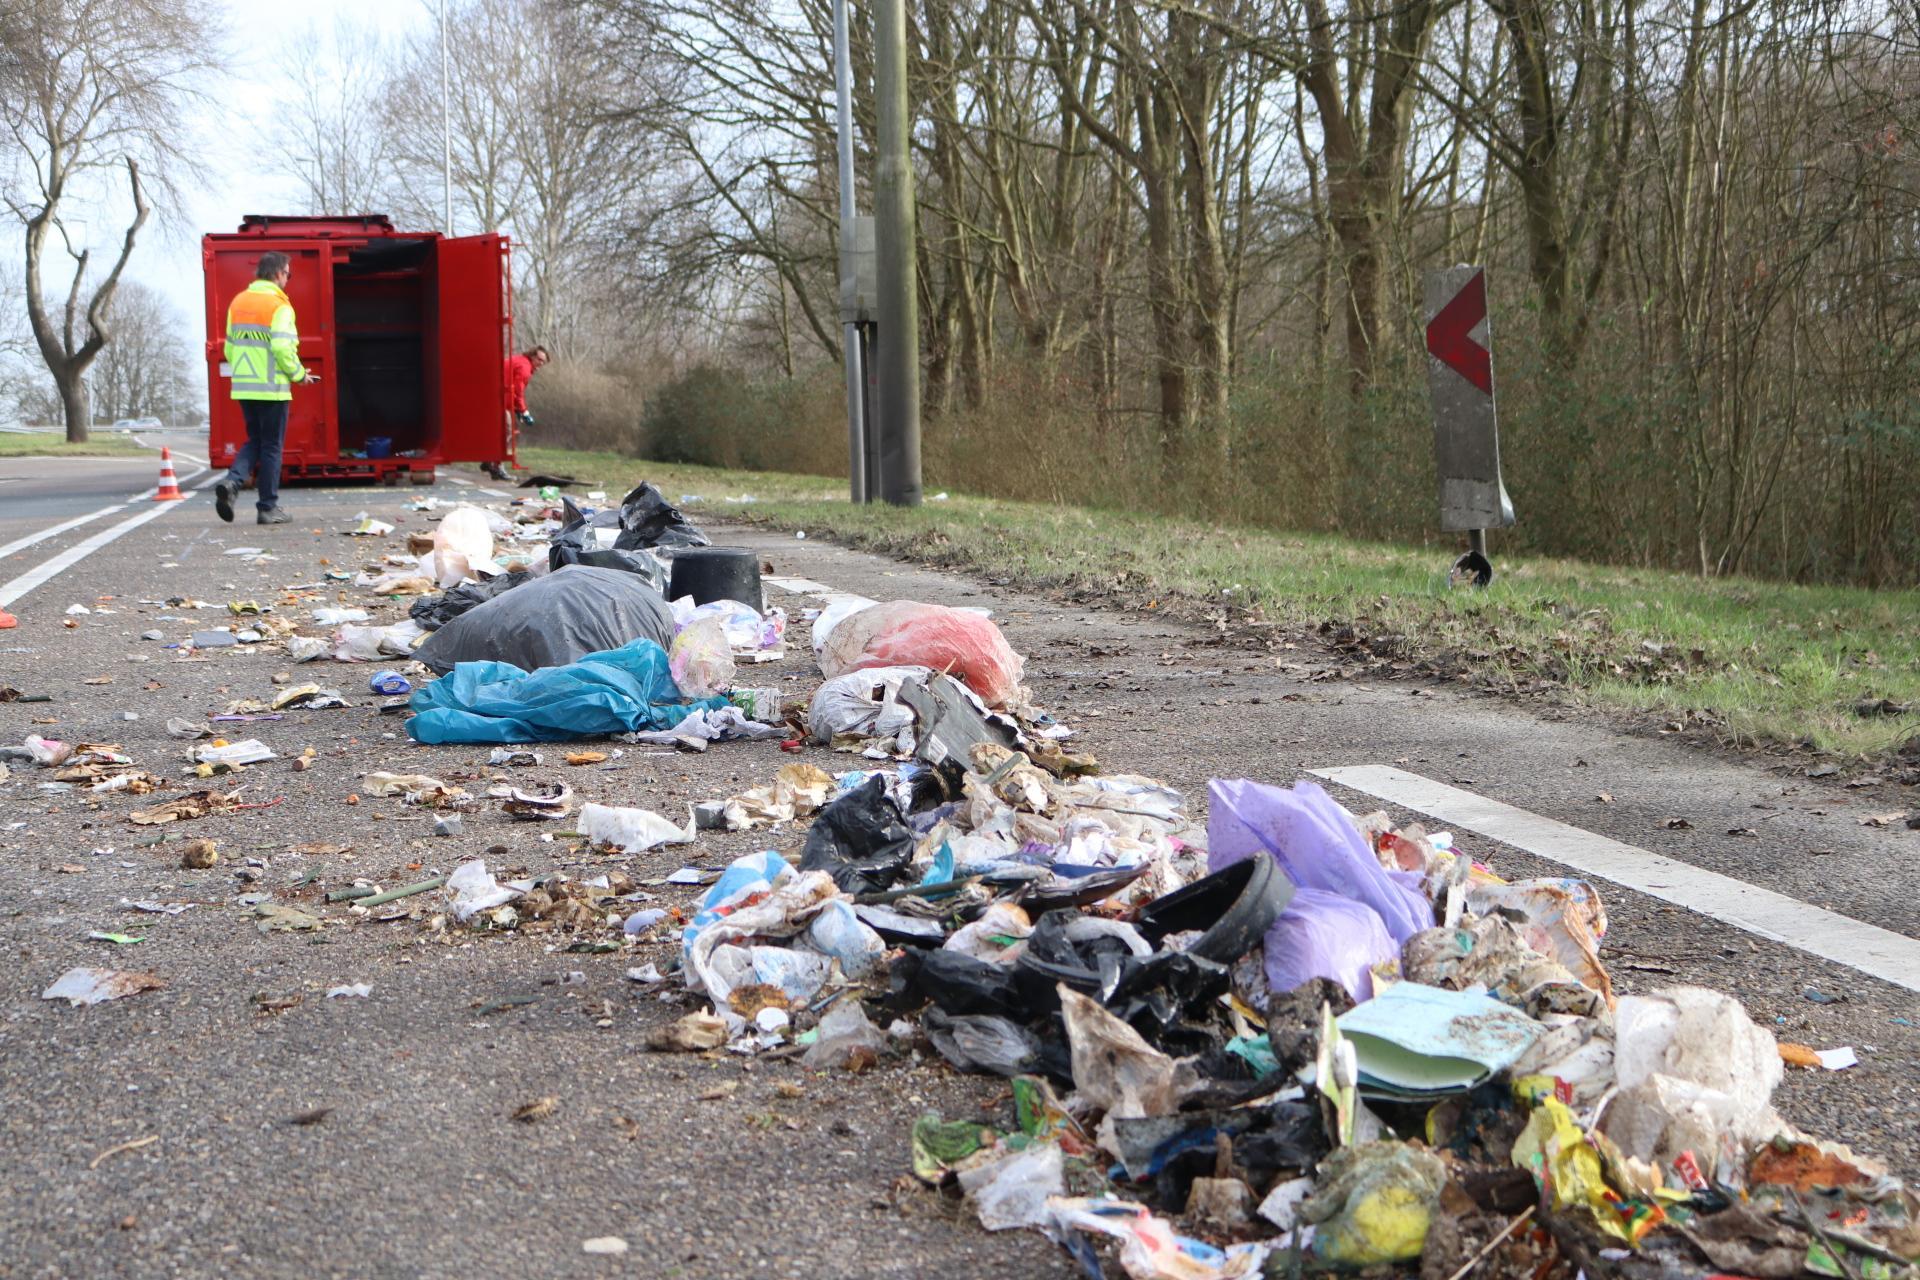 Oprit A44 Sassenheim bedolven onder afval; weg afgesloten